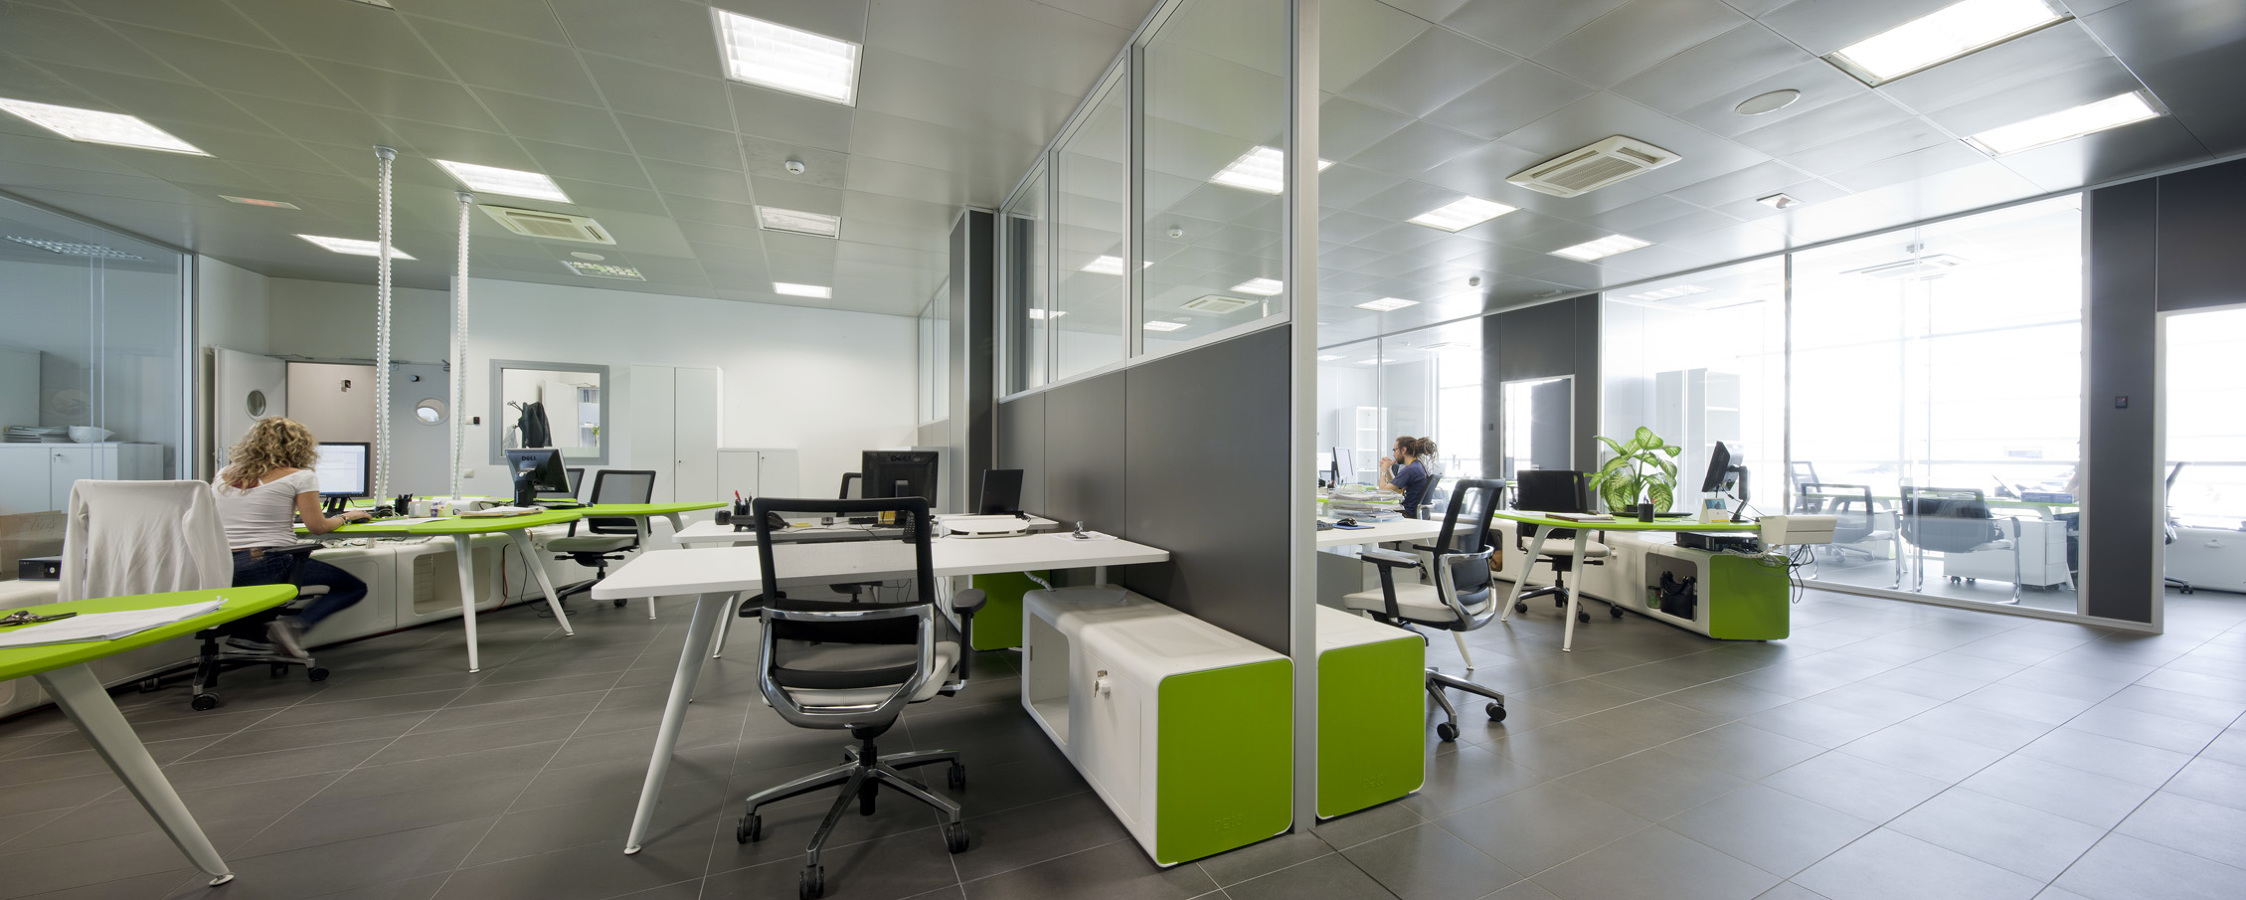 Foto proyecto imdea energia de espacio aretha 242640 for Oficina empleo ourense